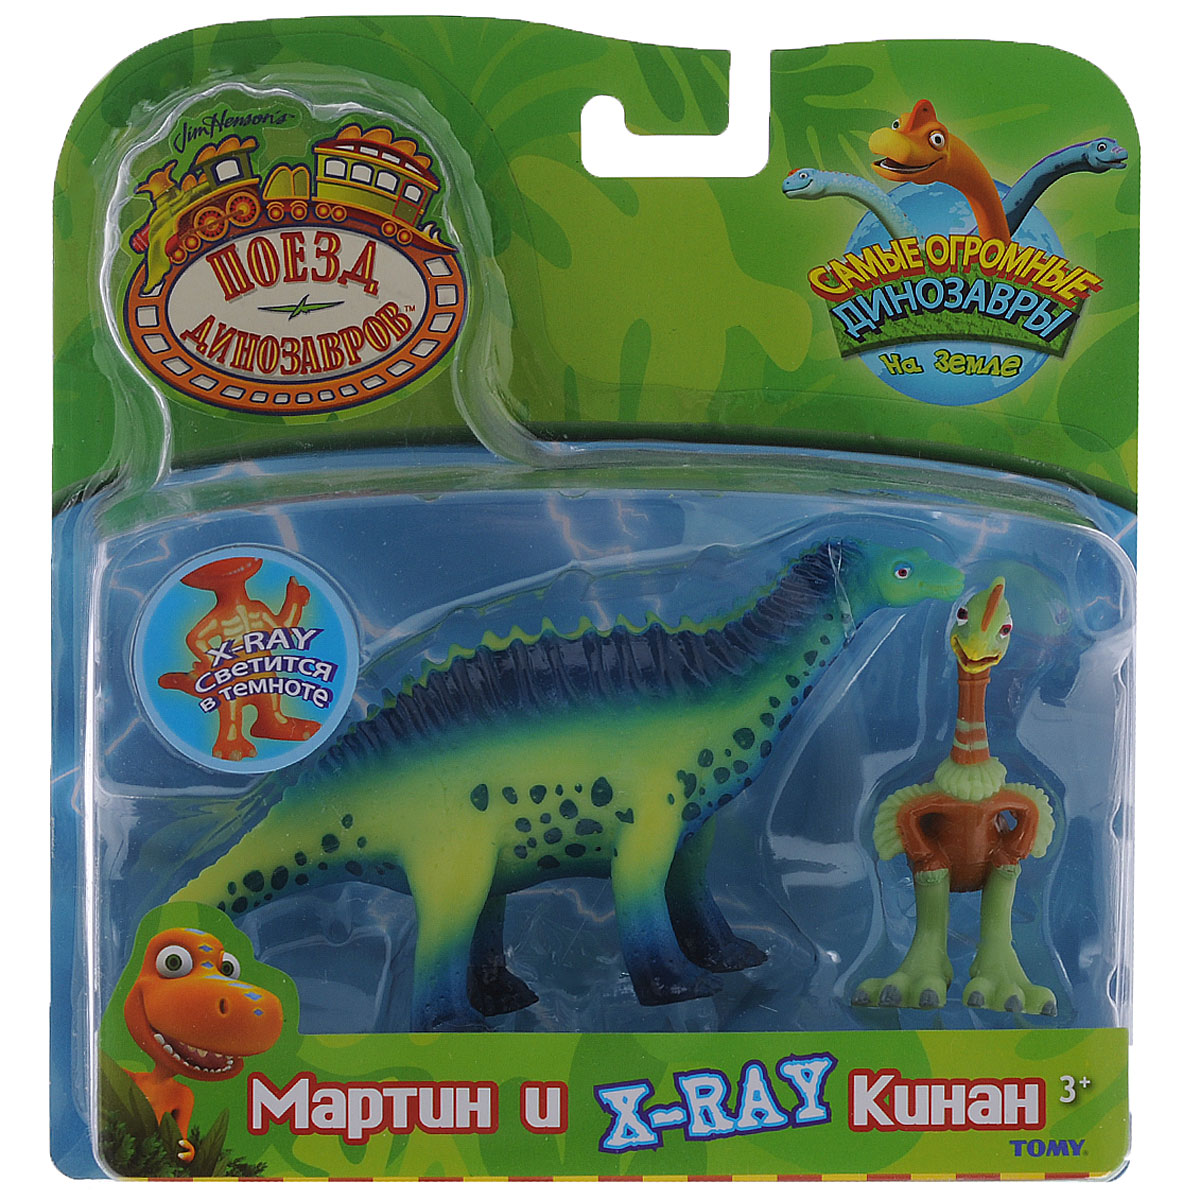 цена на Набор фигурок Tomy Поезд Динозавров: Мартин и X-Ray Кинан